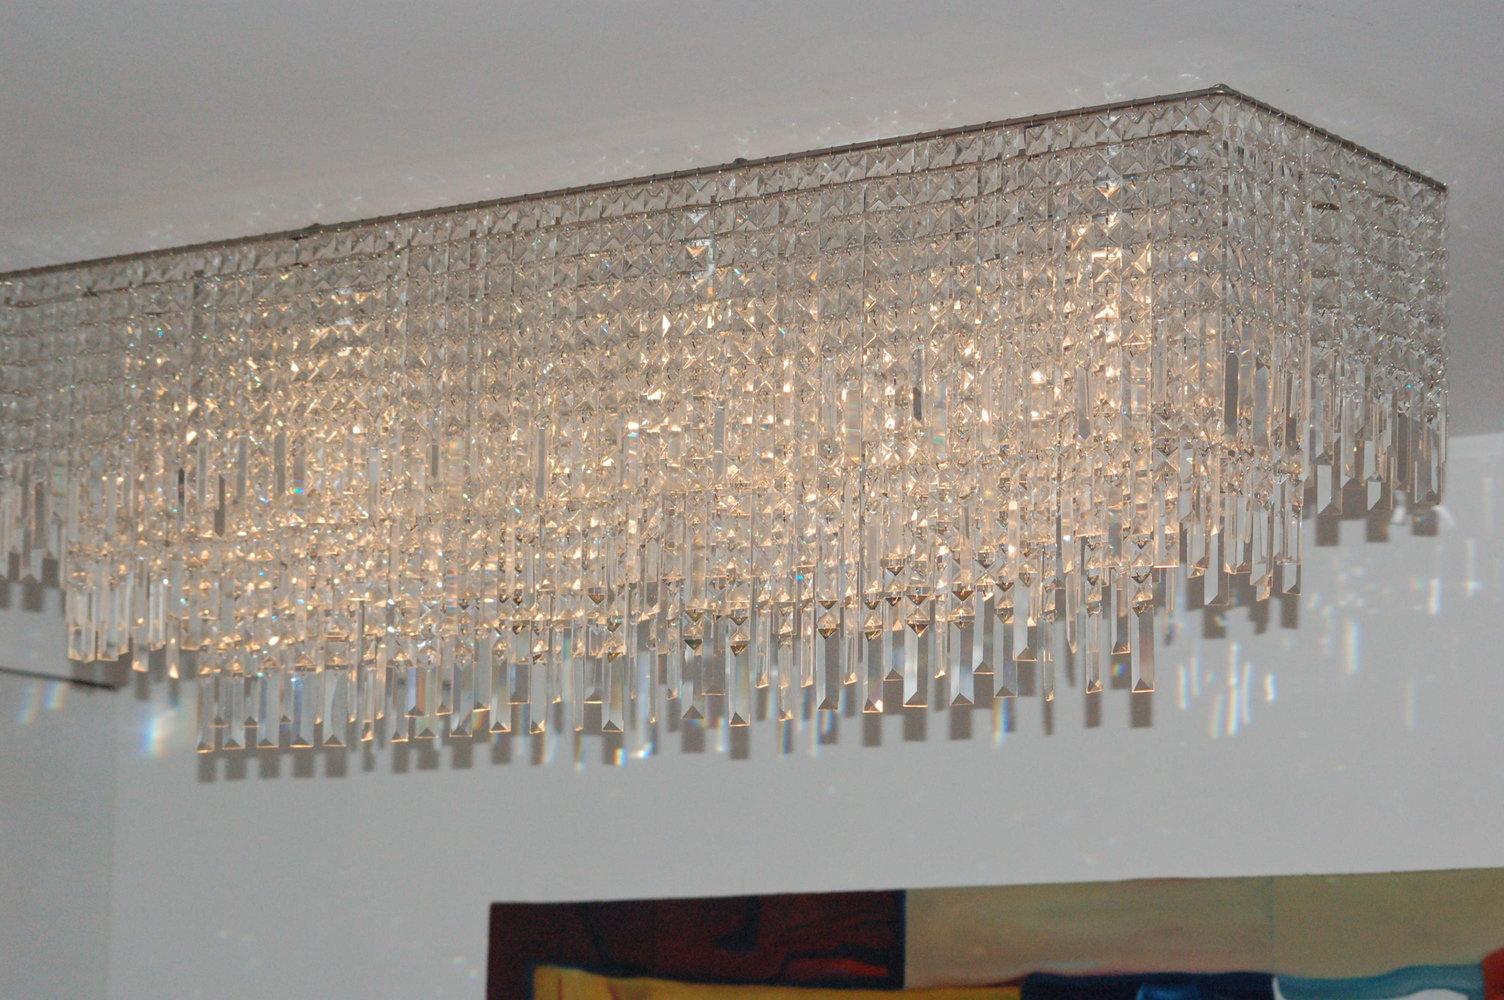 Materials: 35 little Ikea Chandeliers + LEDING lamp - Unique Chandeliers - IKEA Hackers